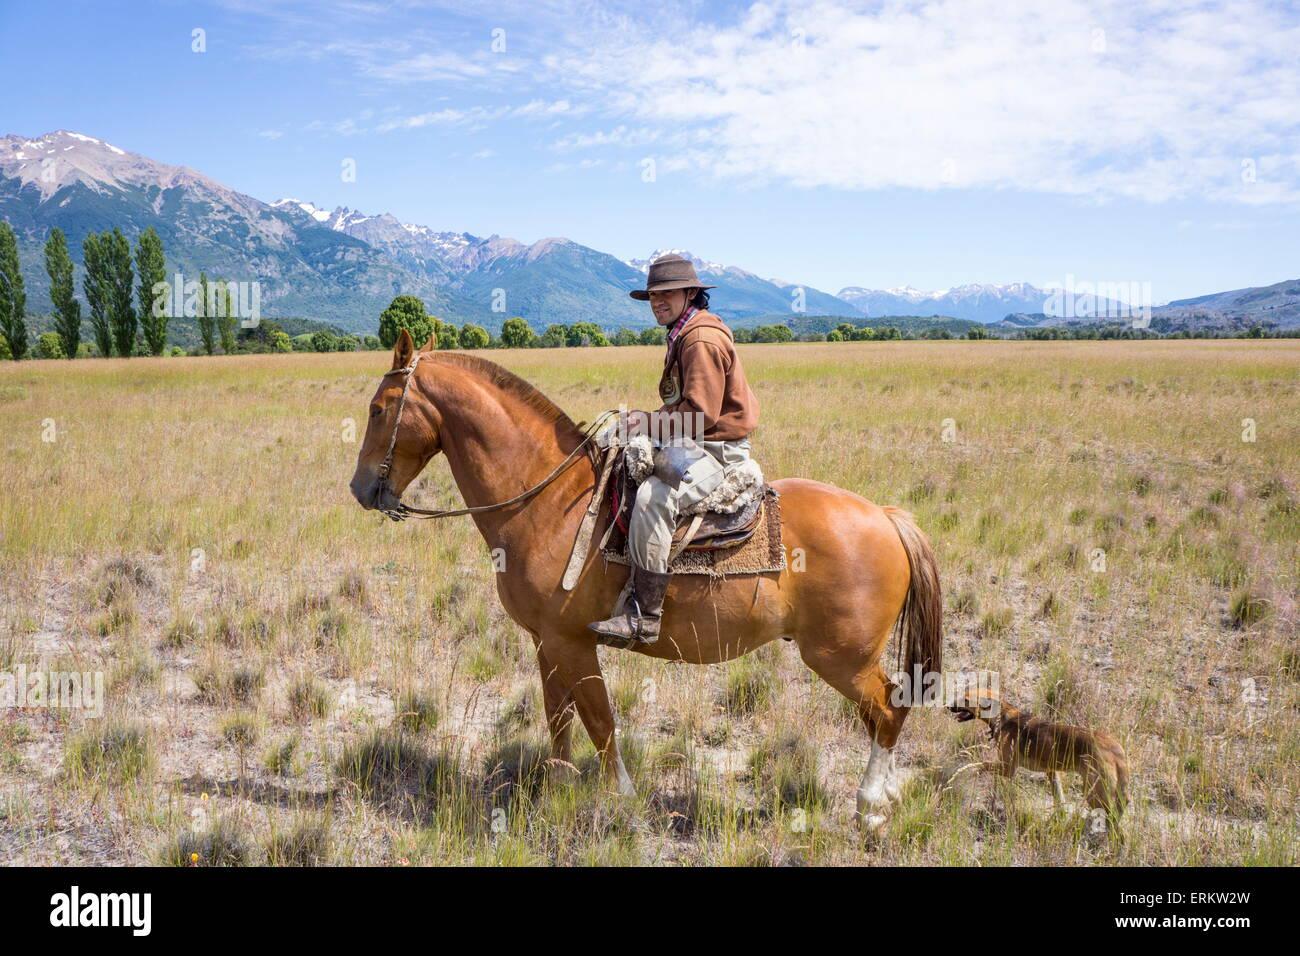 Gaucho on horseback, Patagonia, Argentina, South America Stock Photo